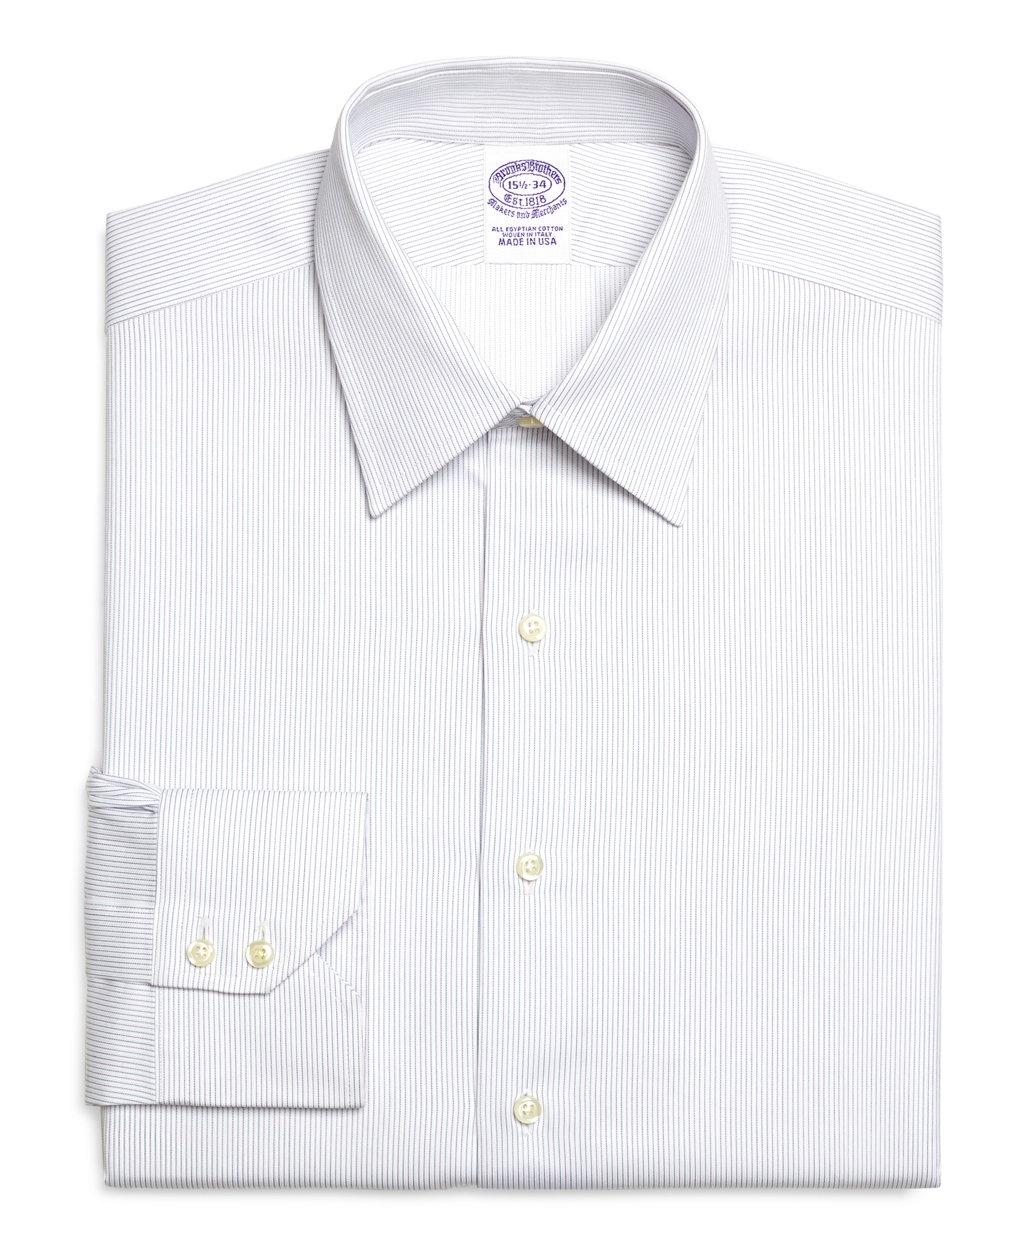 Brooks brothers extra slim fit alternating stripe dress for Best extra slim fit dress shirts